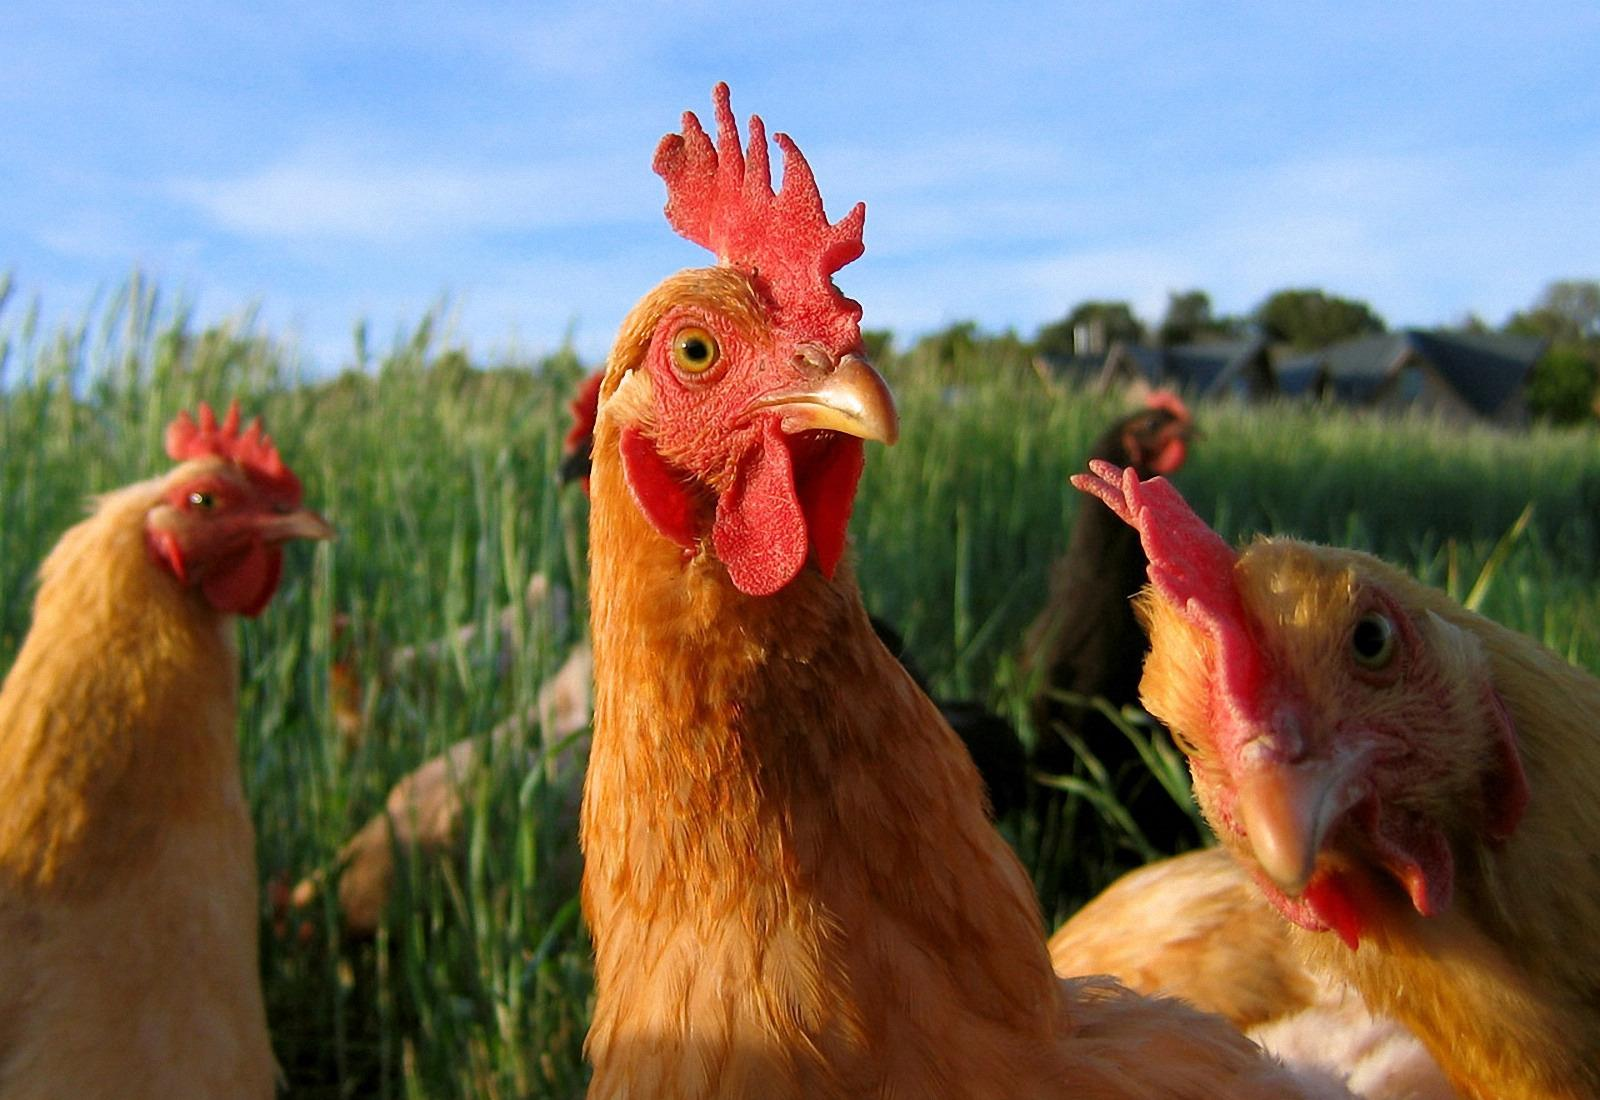 Chicken Wallpapers Fun Animals Wiki Videos Pictures Stories 1600x1100